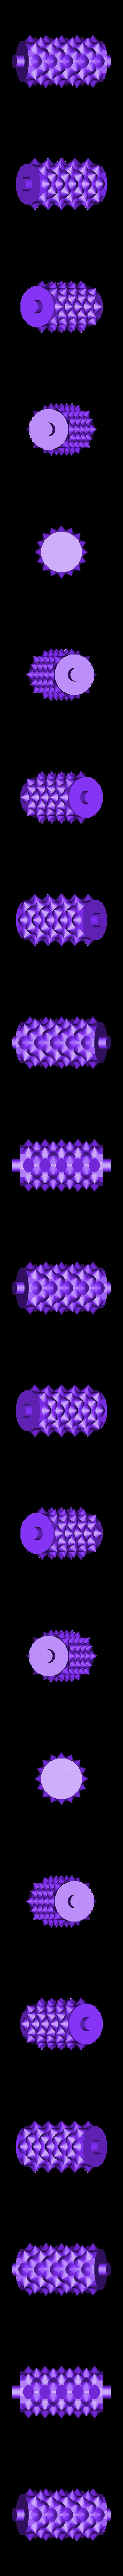 Mas_C2.stl Download free STL file Massage tool (+v2) • 3D printing design, kpawel